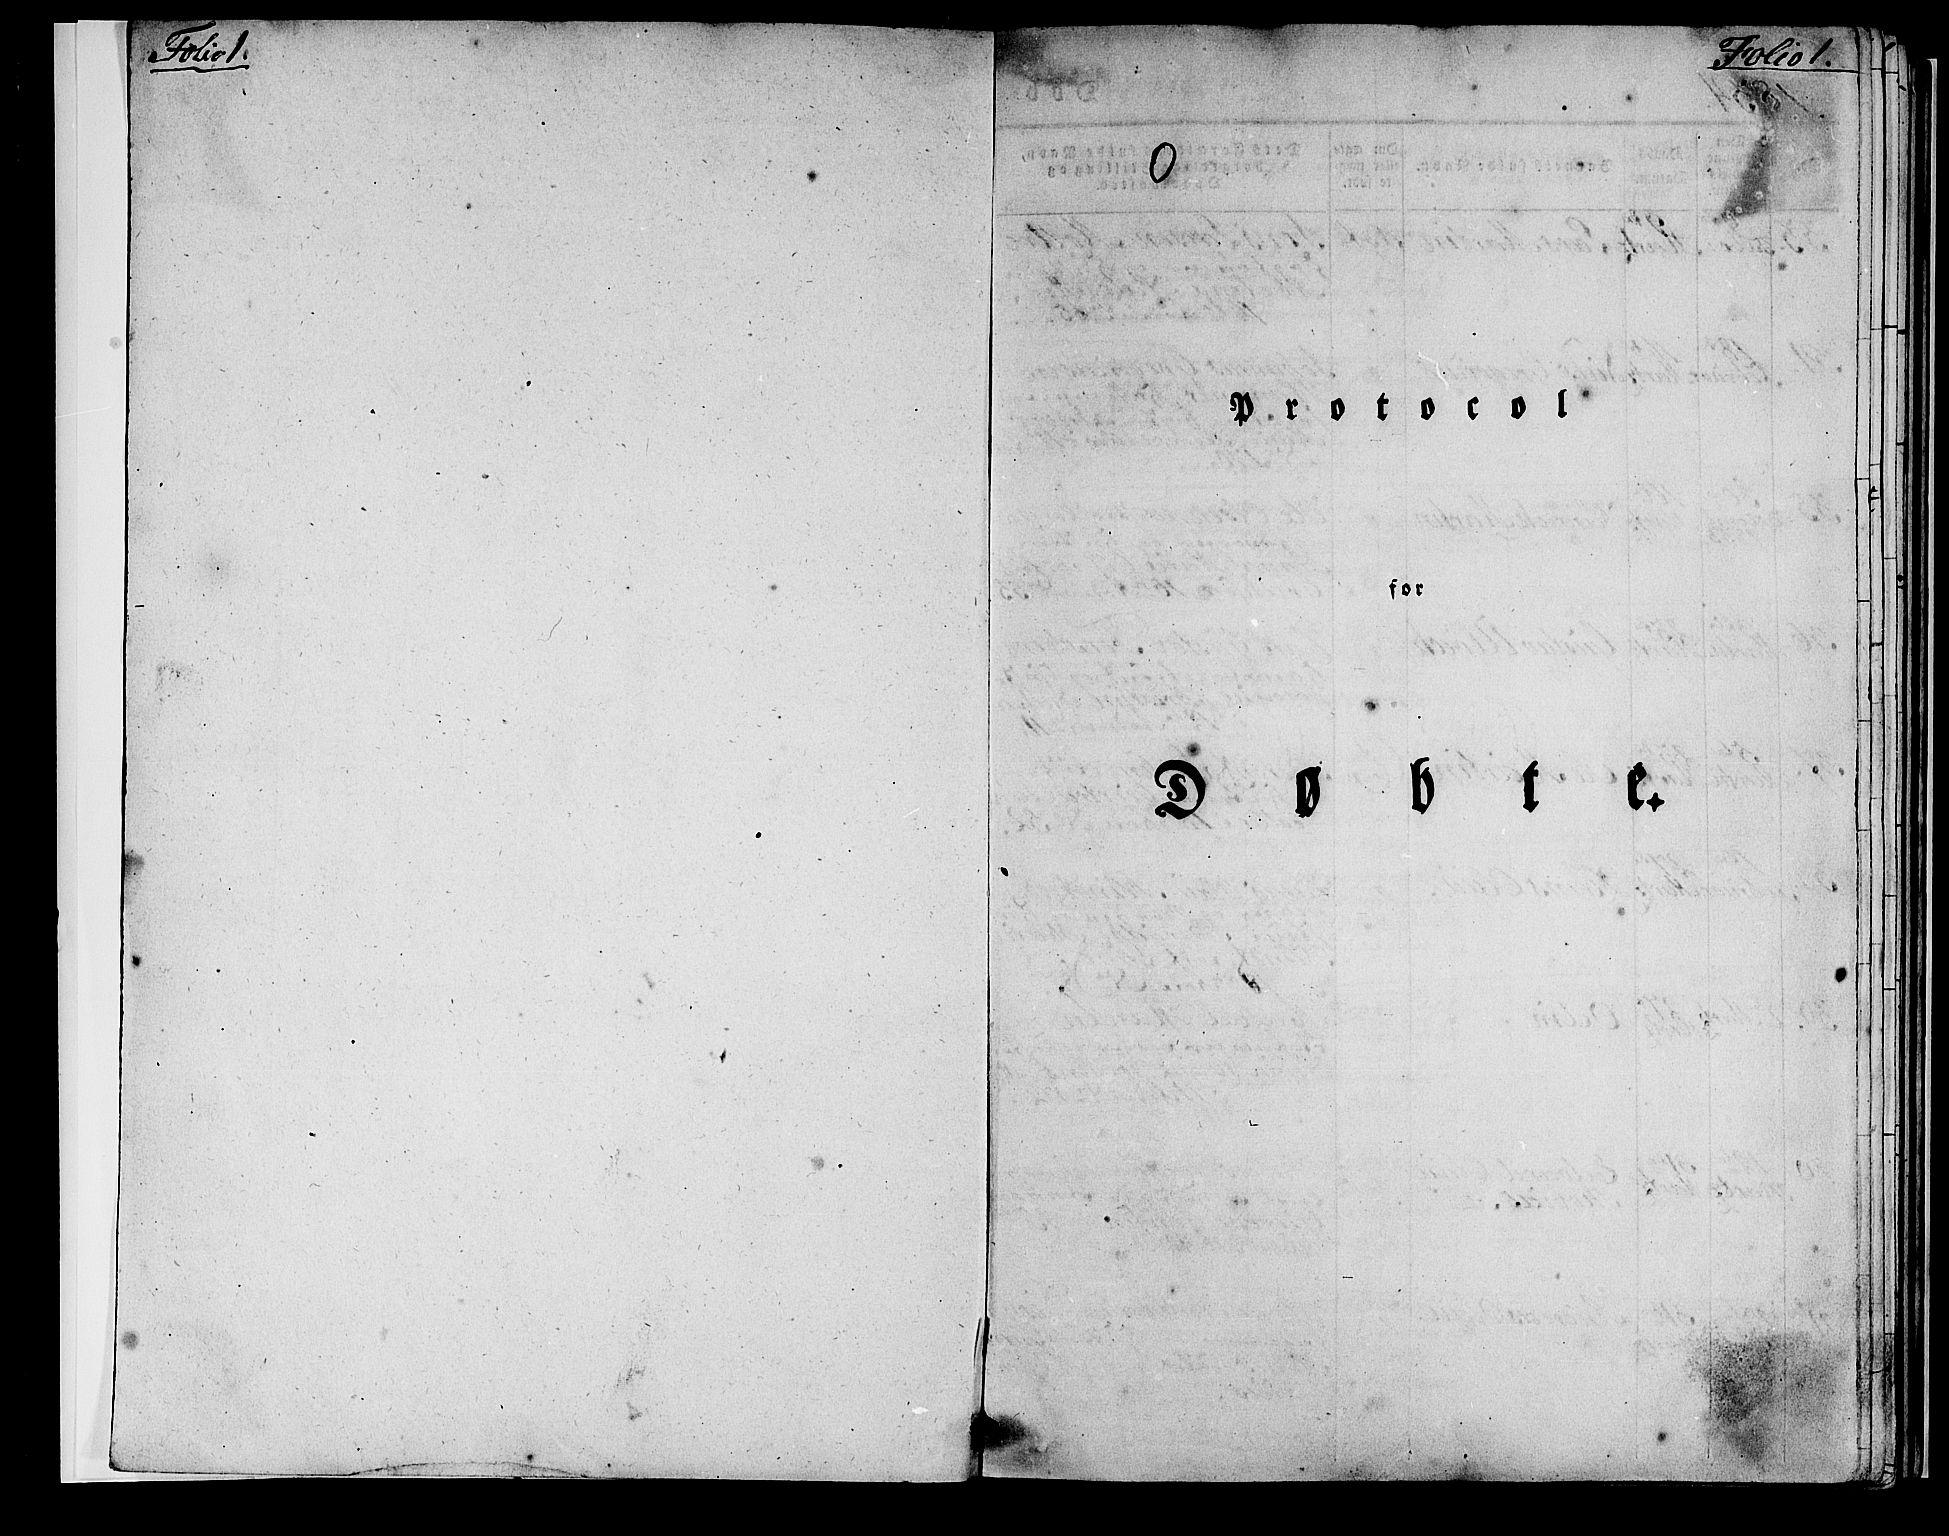 SAB, Domkirken sokneprestembete, H/Haa/L0014: Ministerialbok nr. A 13, 1830-1837